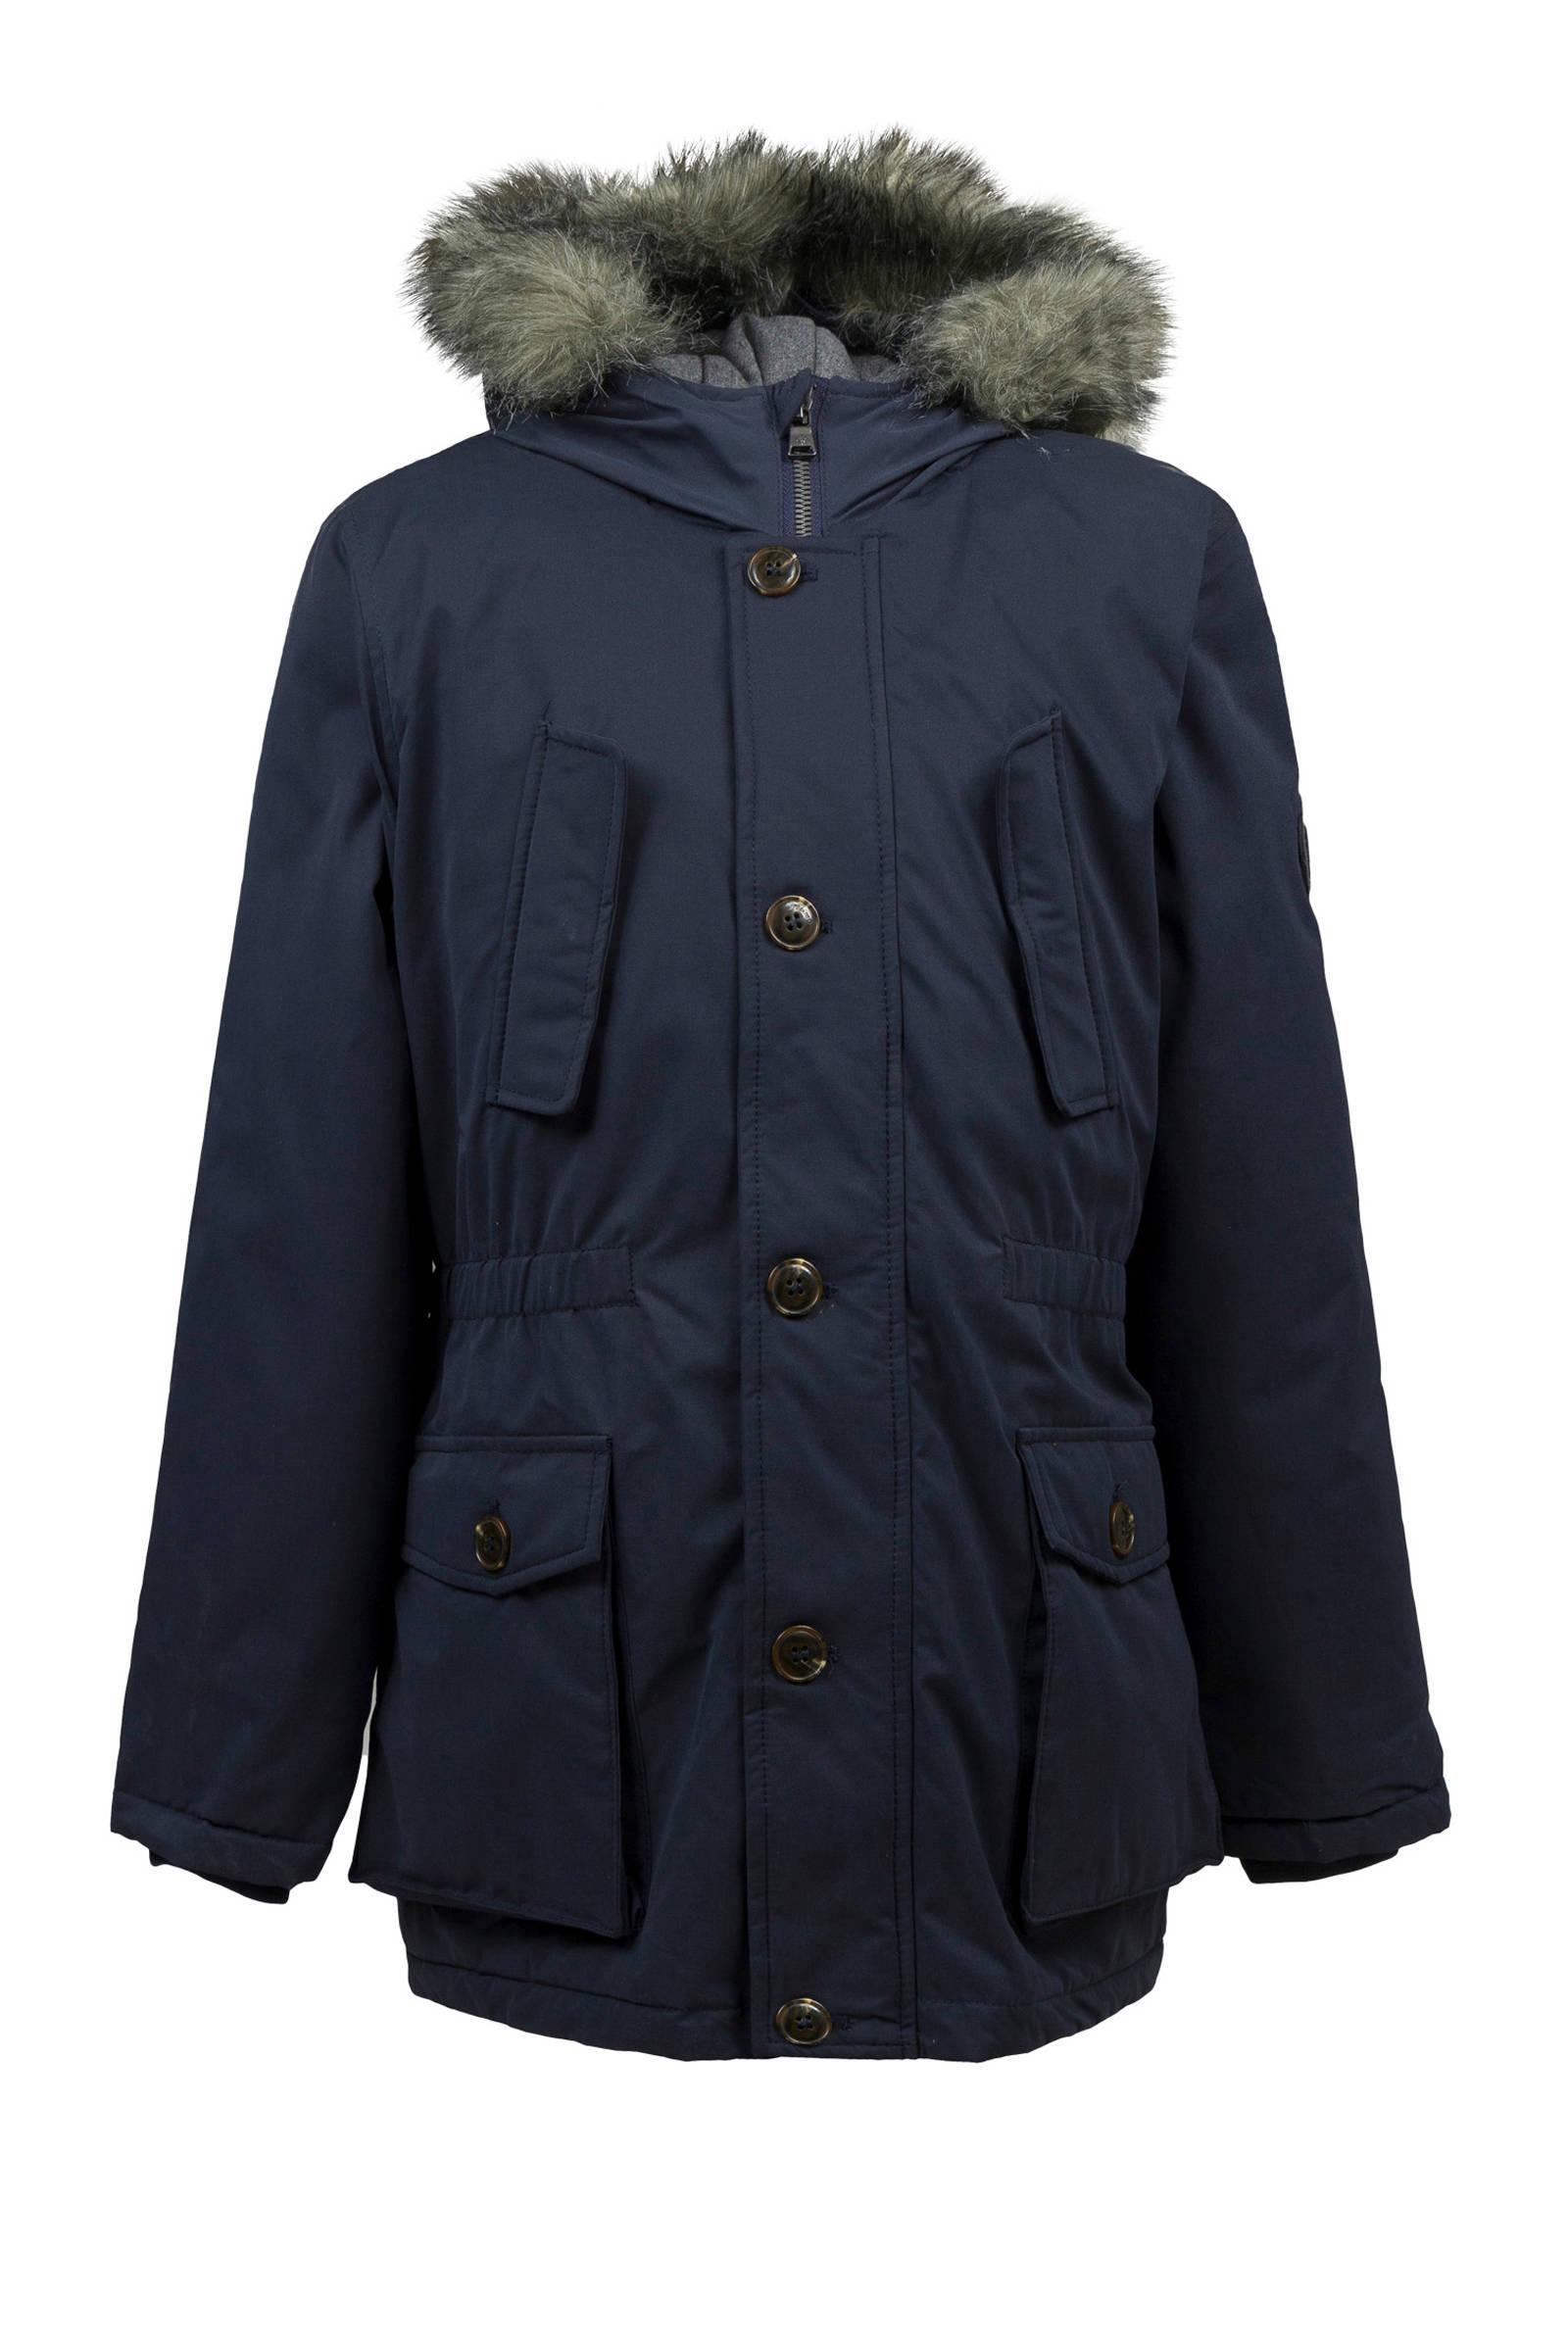 warme trendy winterjas